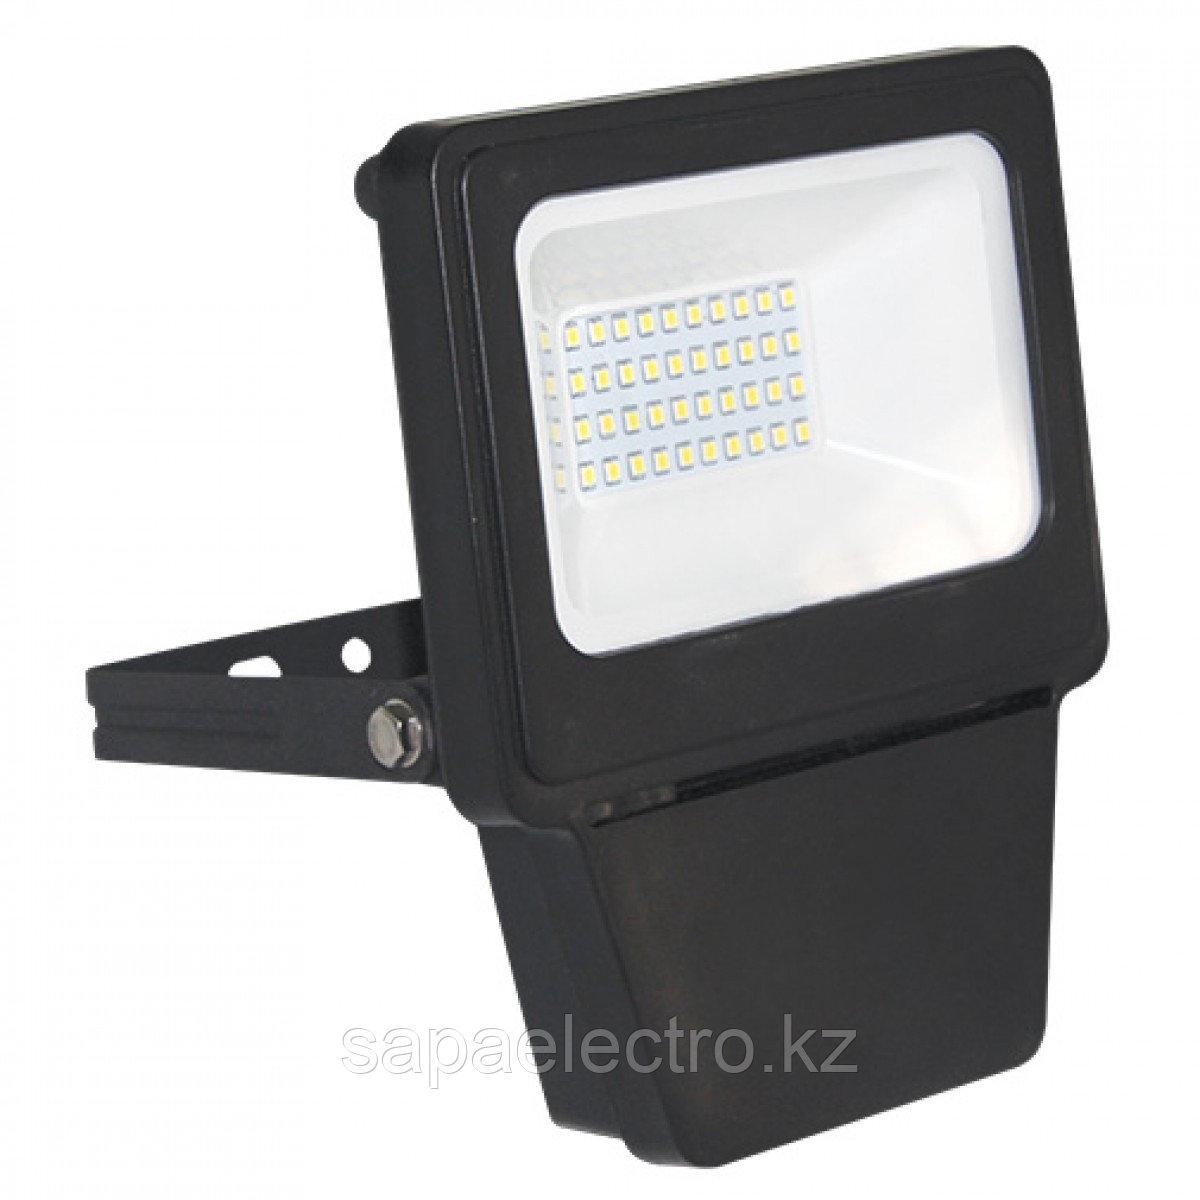 Прожектор LED SMD 20W BLACK 6000K  (TS)28шт